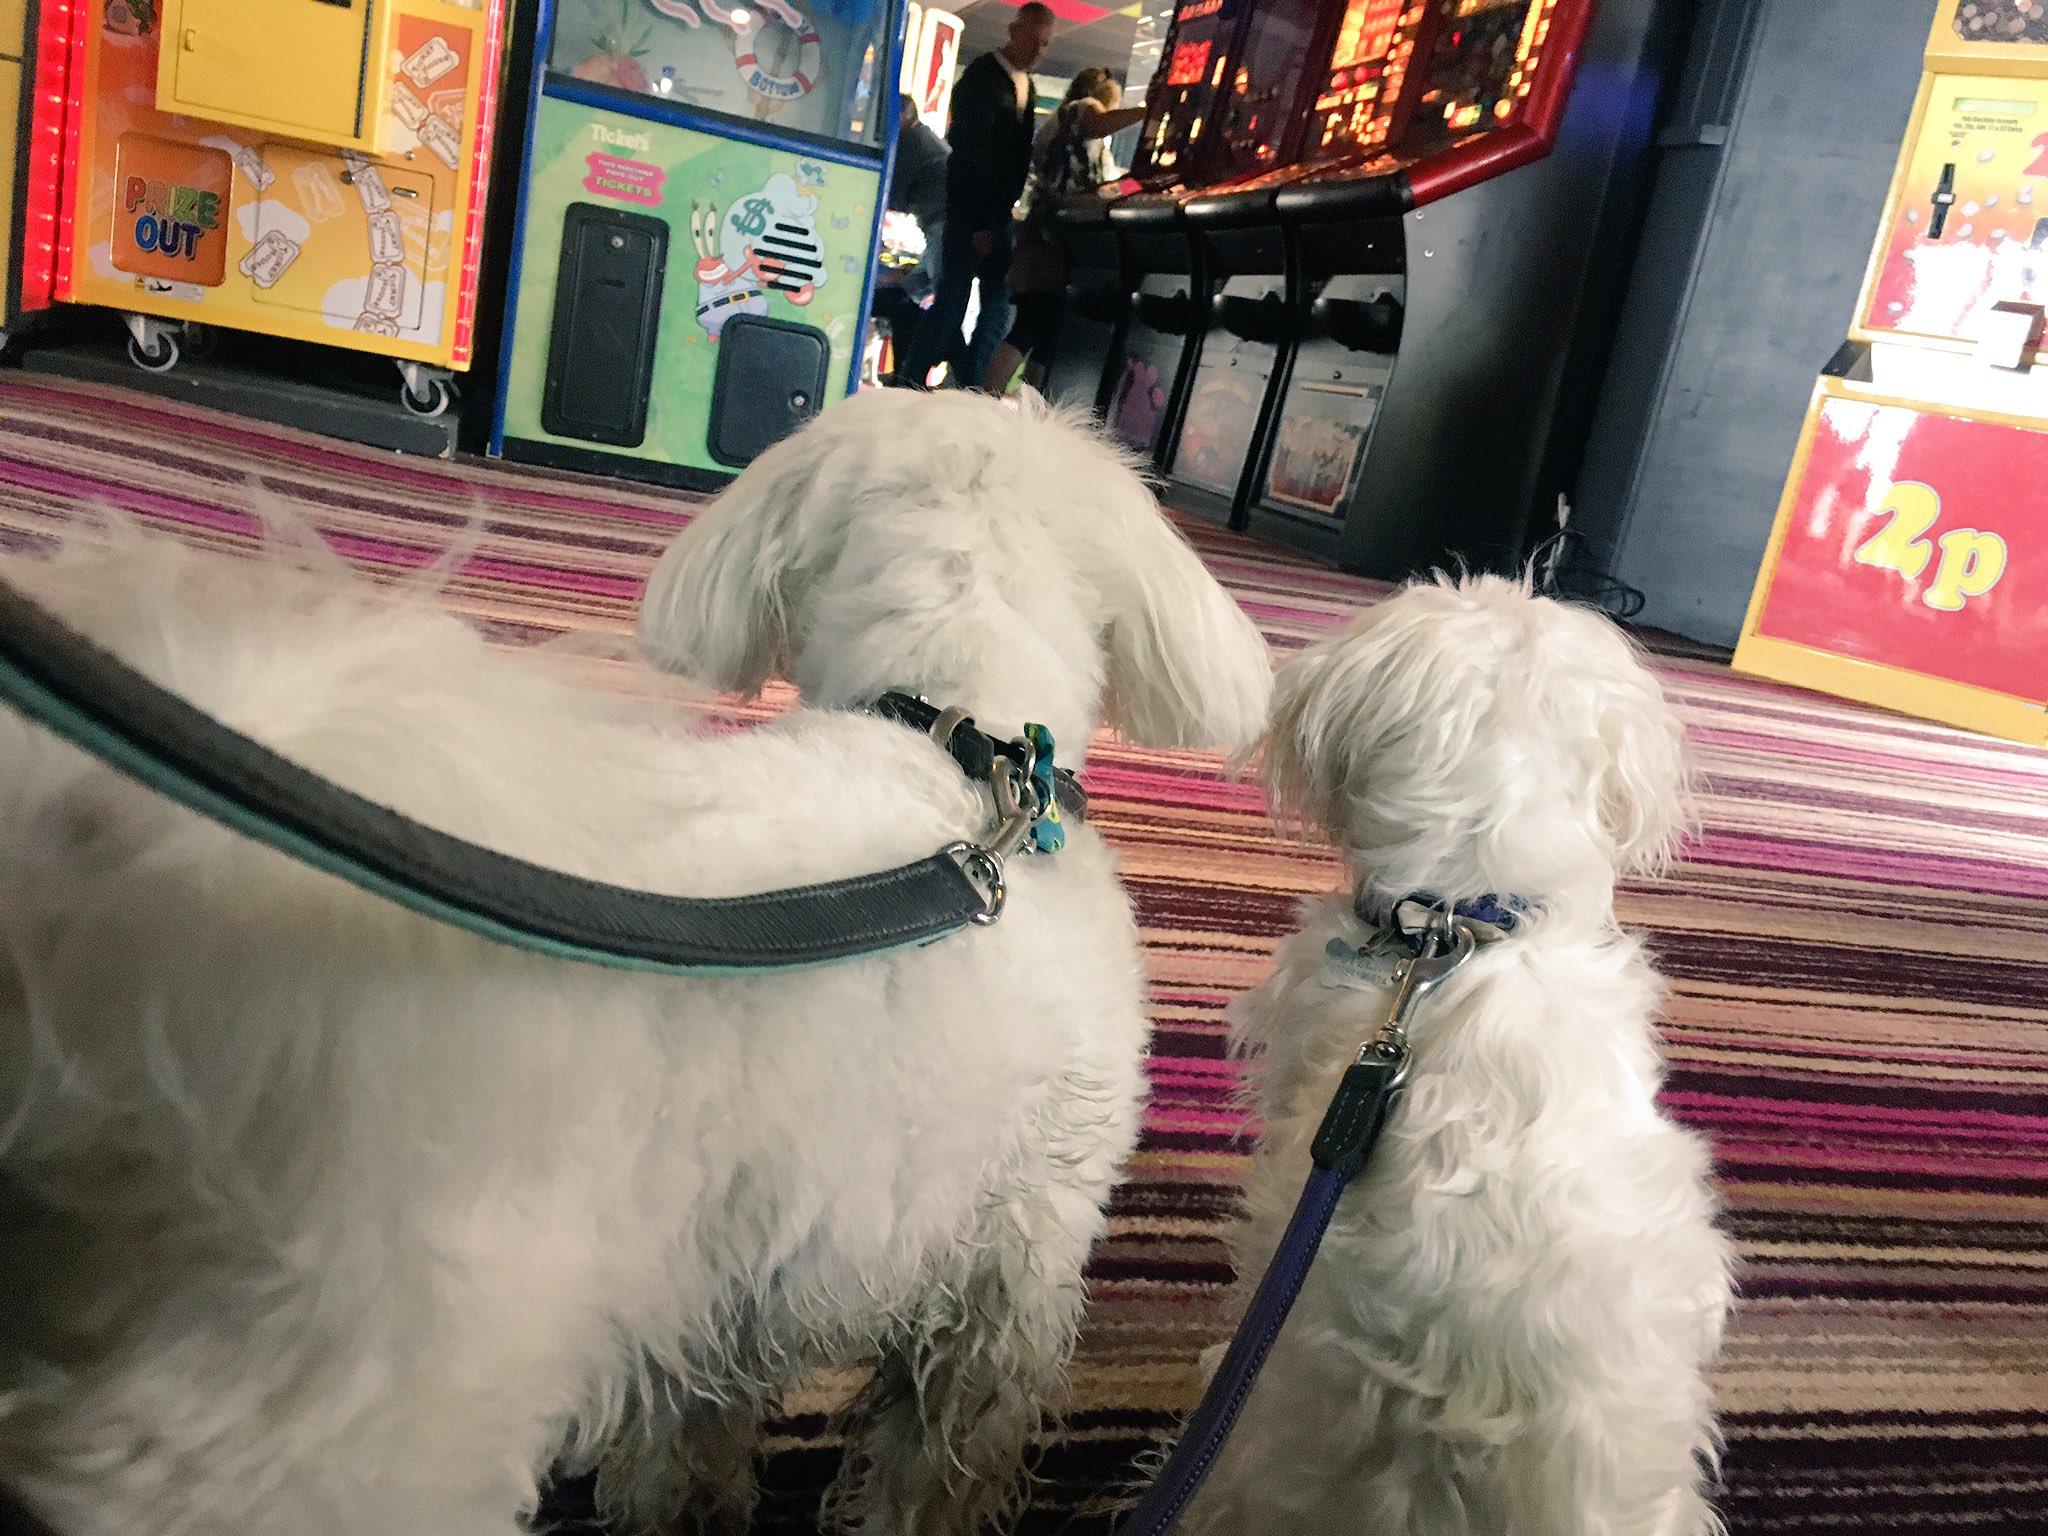 Dogs loving the arcade. #BitRainy #Devon https://t.co/aQdSq1COPs